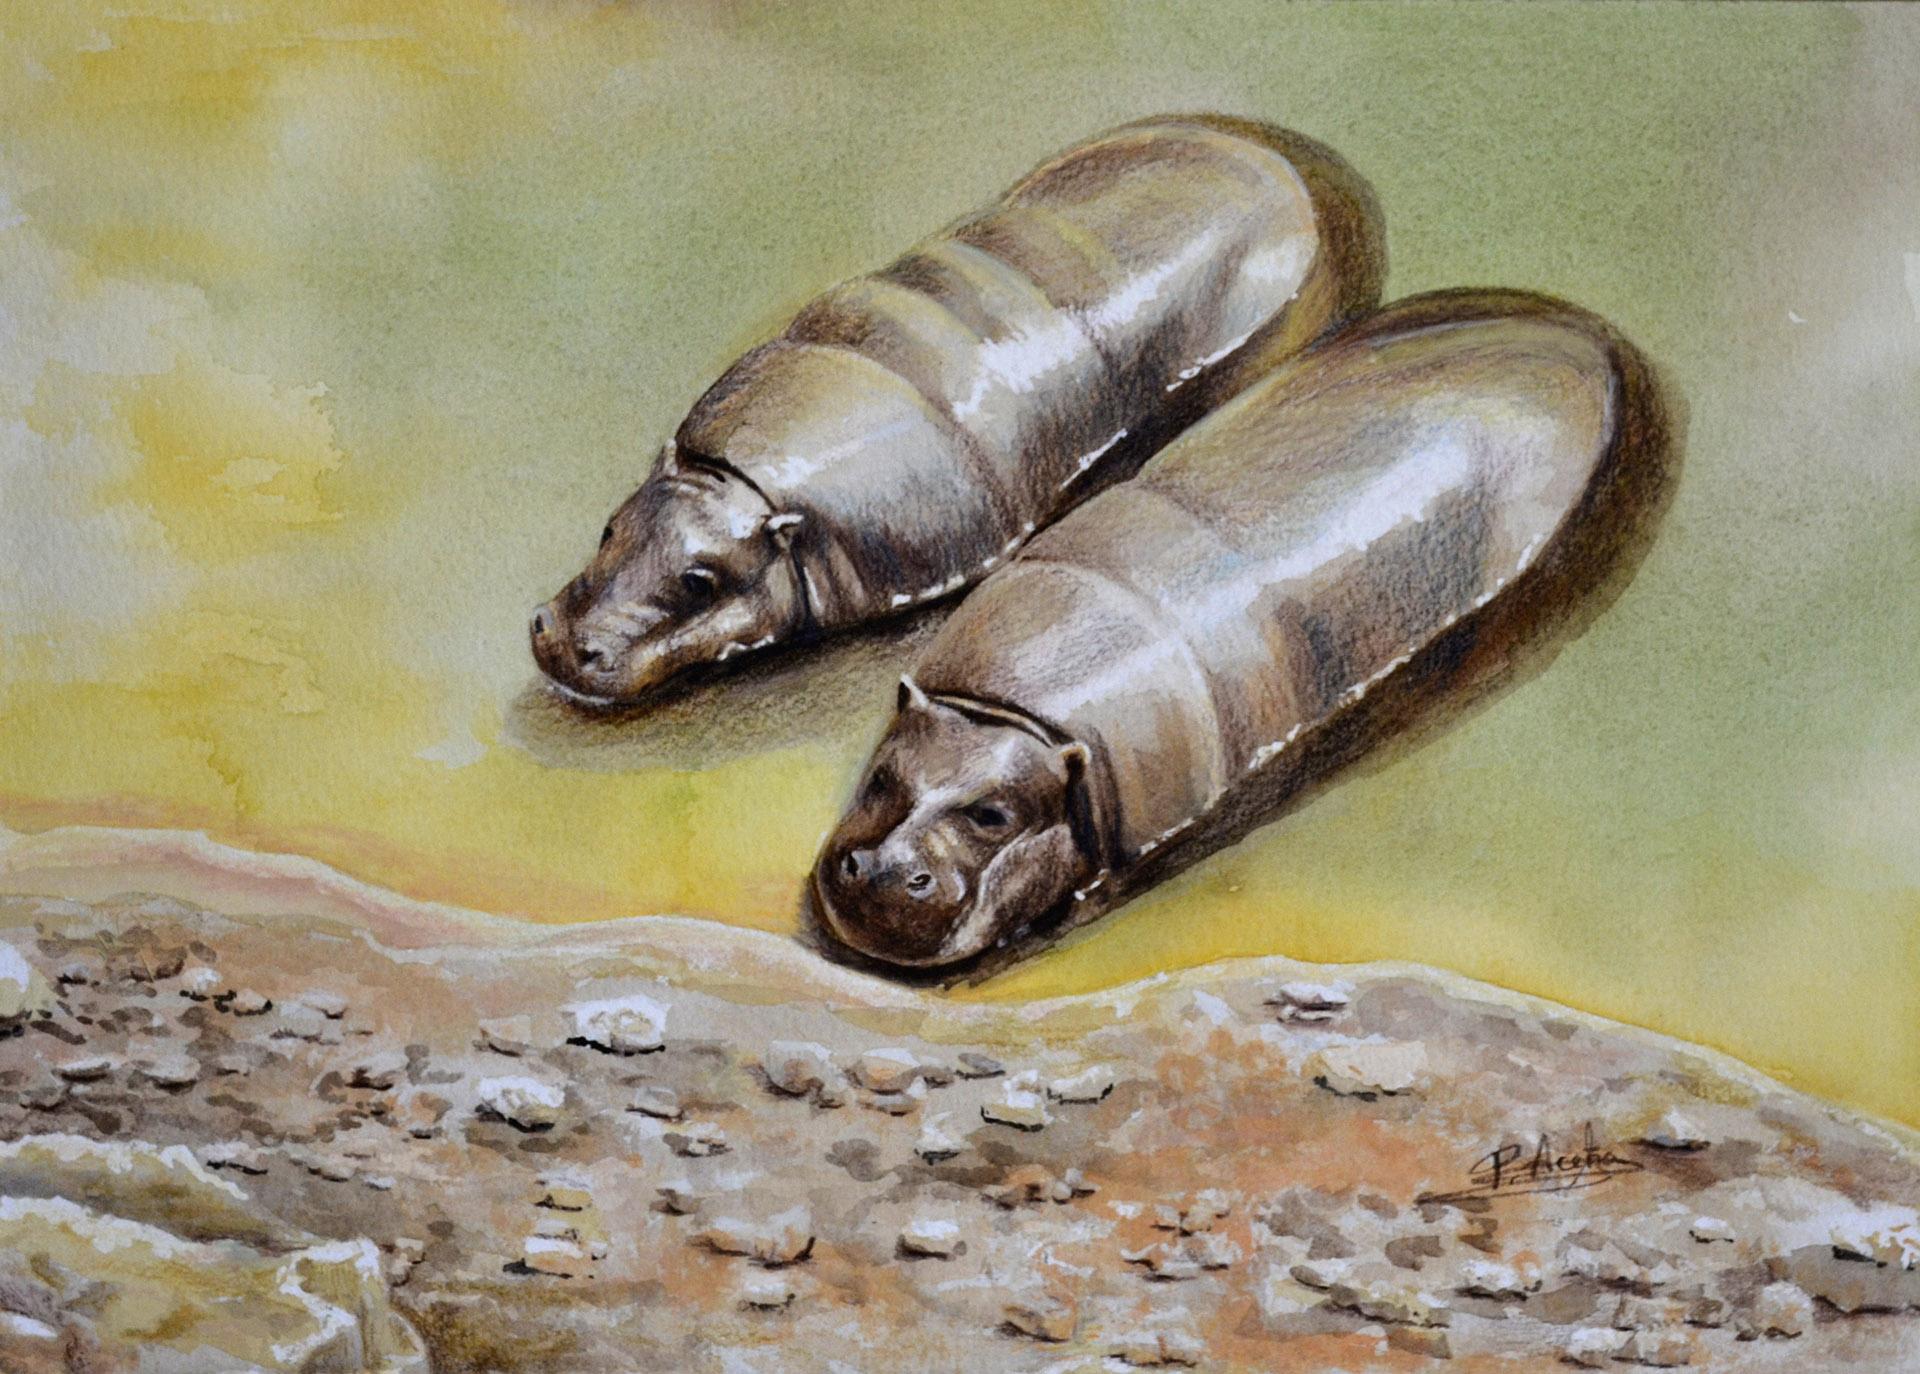 Hipopótamos pigmeo. Pilar Aceña, acuarela. 2018. PVP 125 €